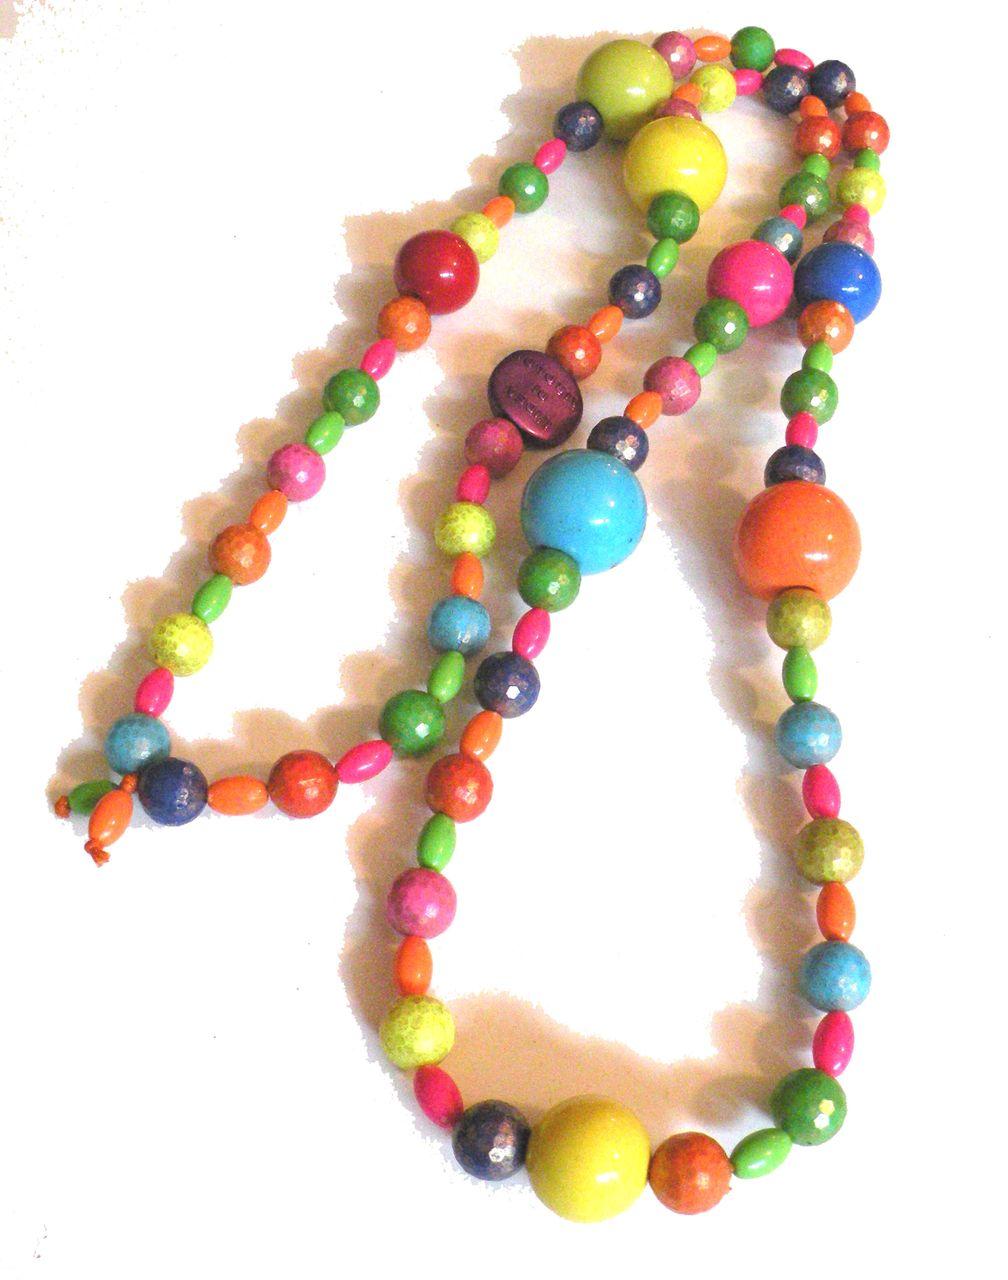 L'IDEA DI AIROLDI Made in Italy Brightly Colored Multi Bead Sautoir Necklace